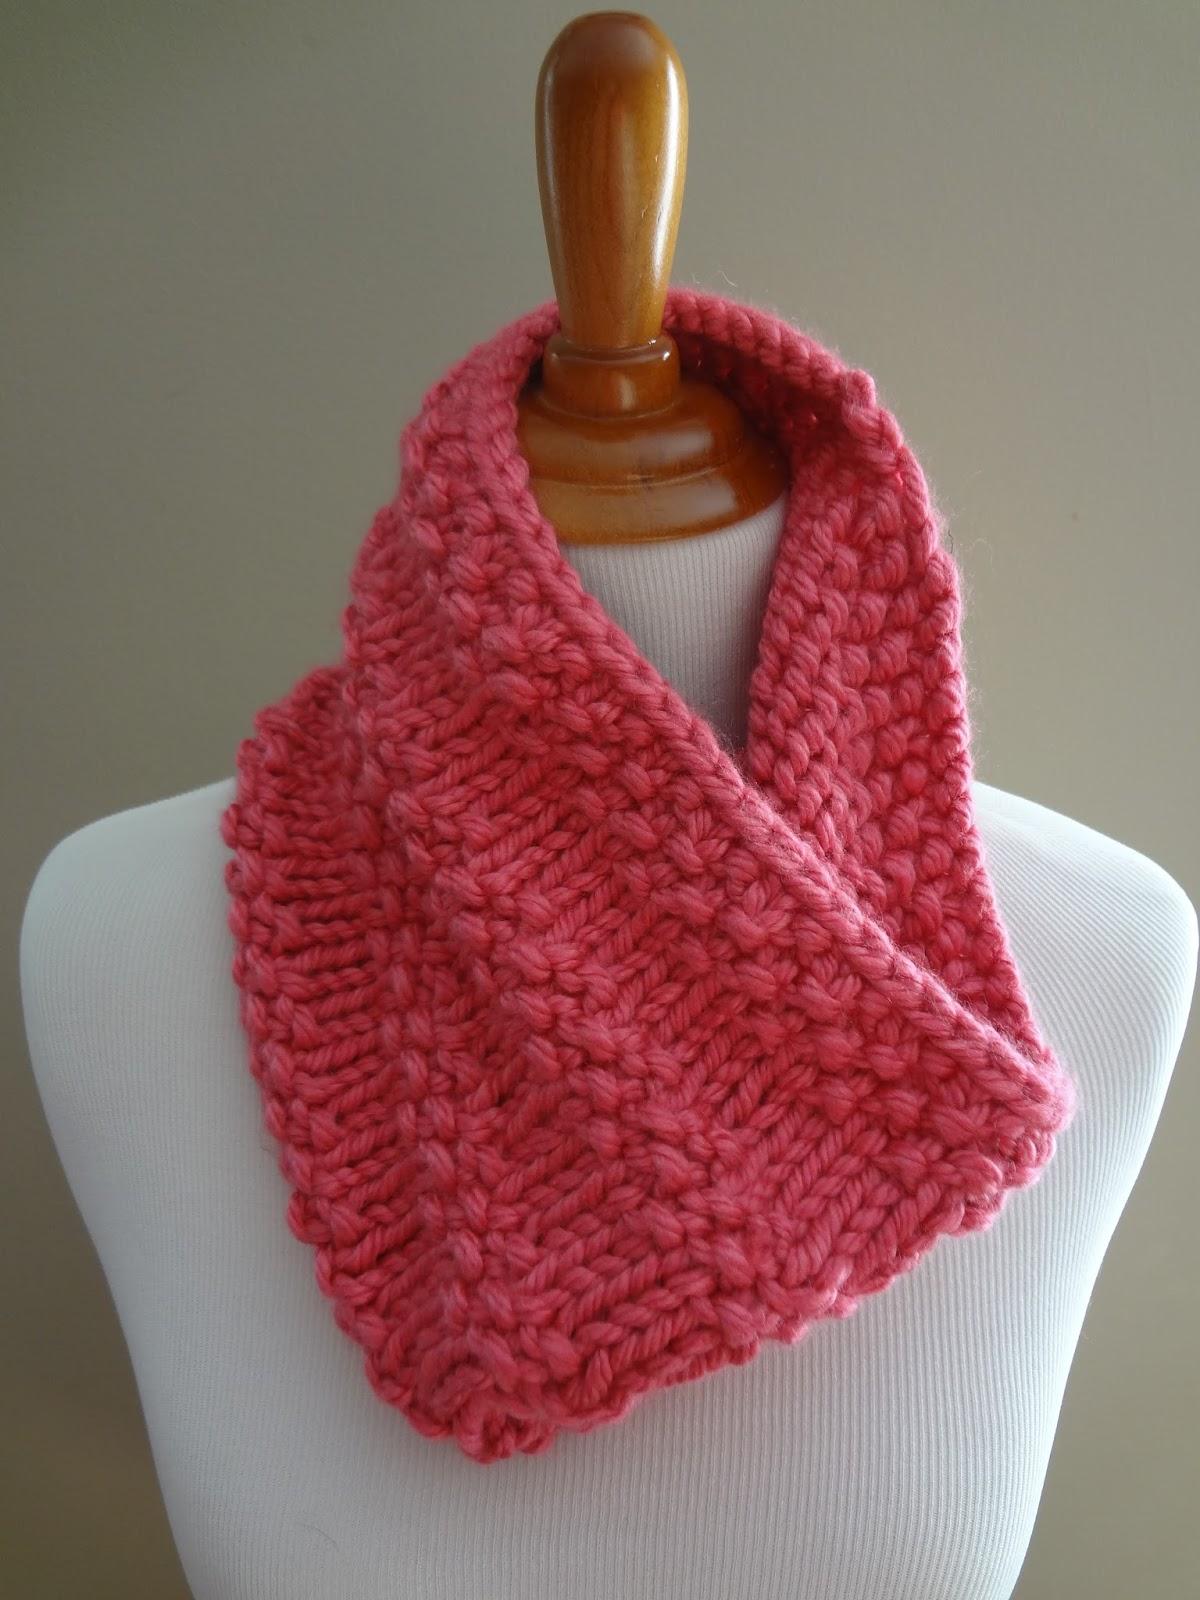 Free Knitting Pattern For Eyelet Cowl : Bubblegum Cowl